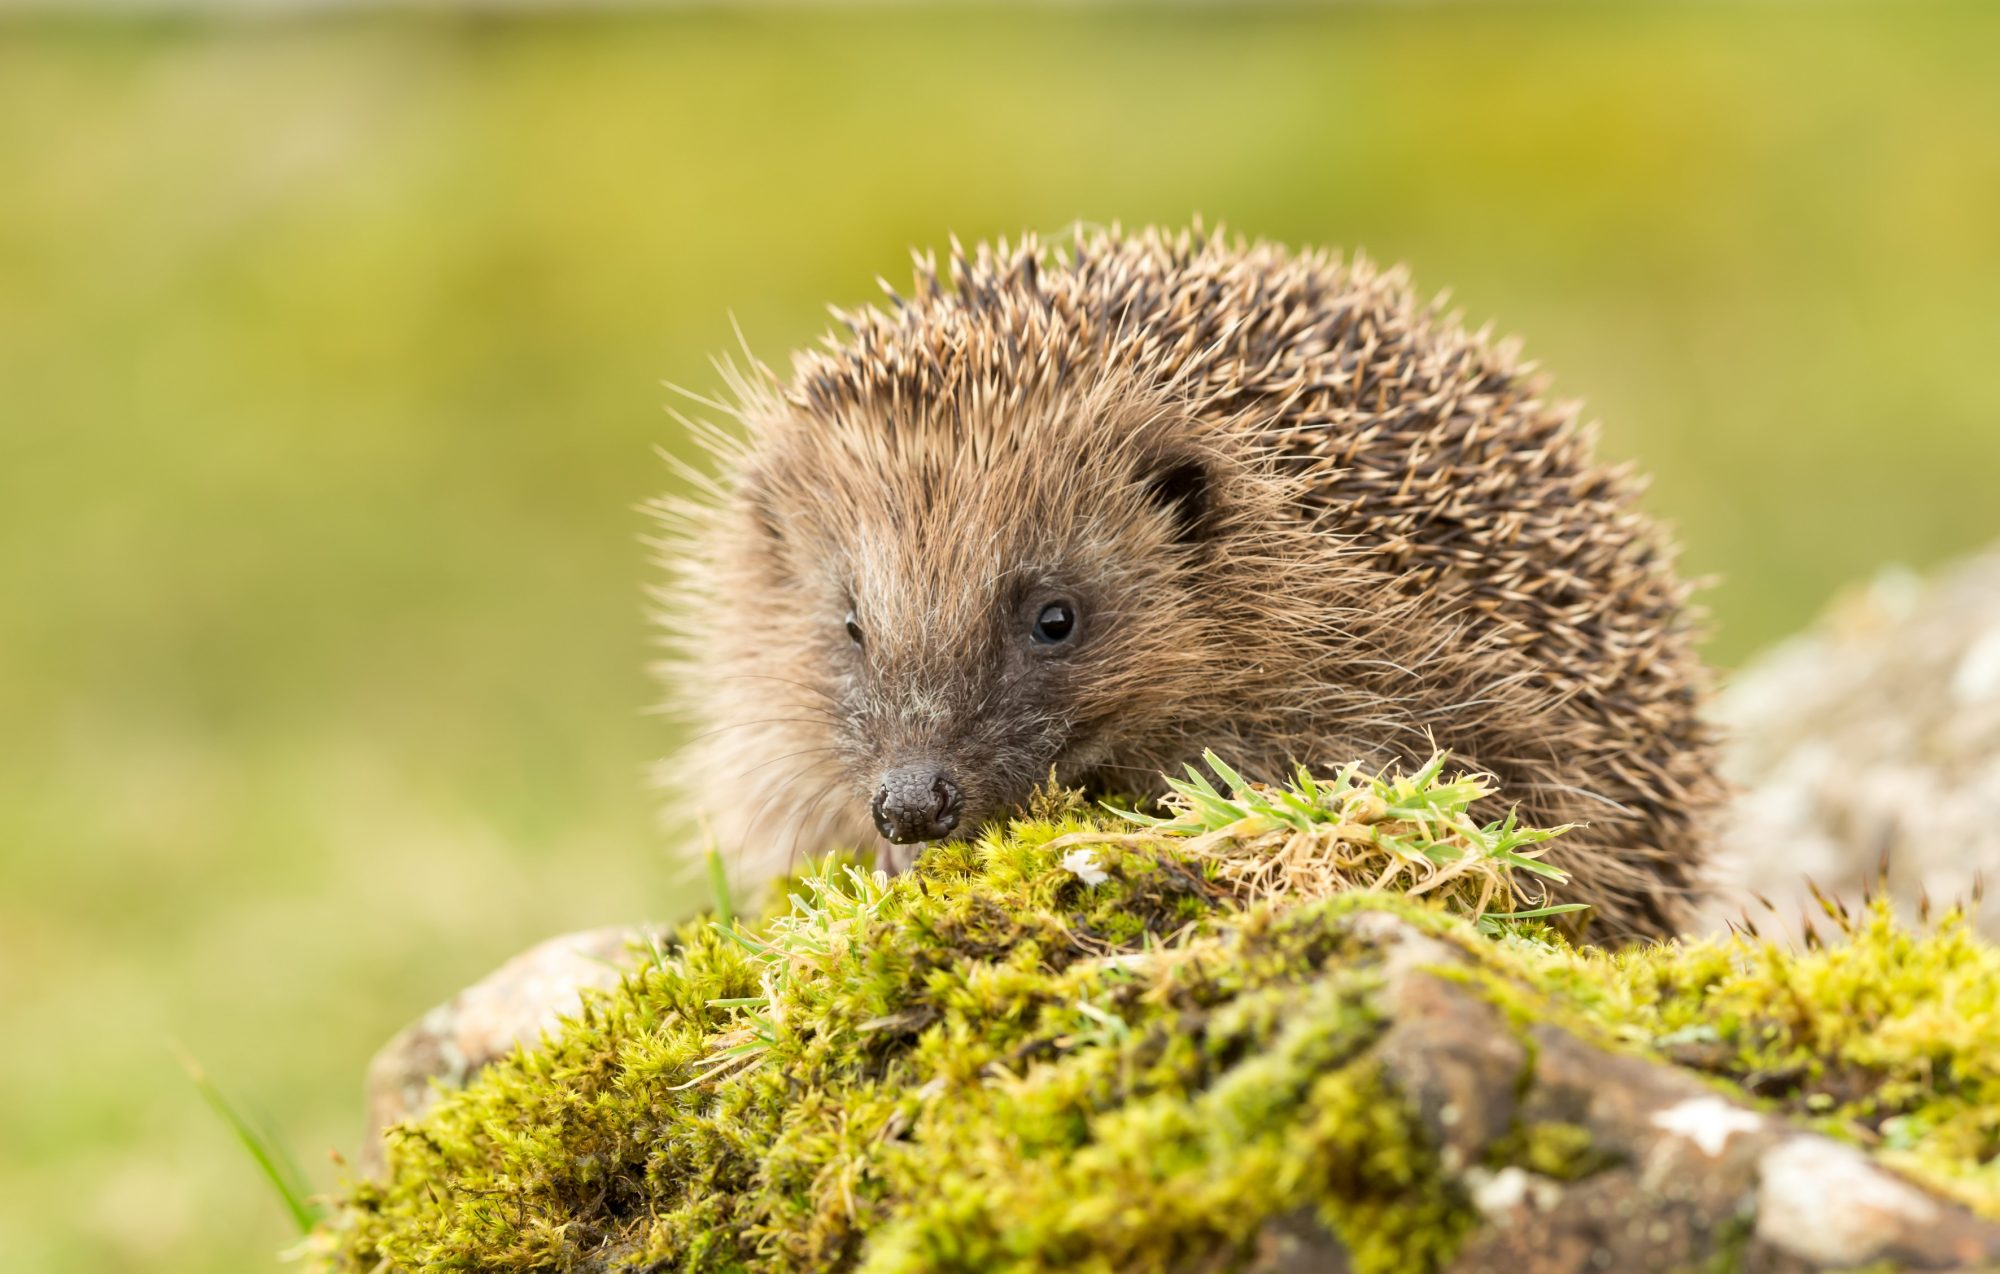 protect british wildlife, developers,